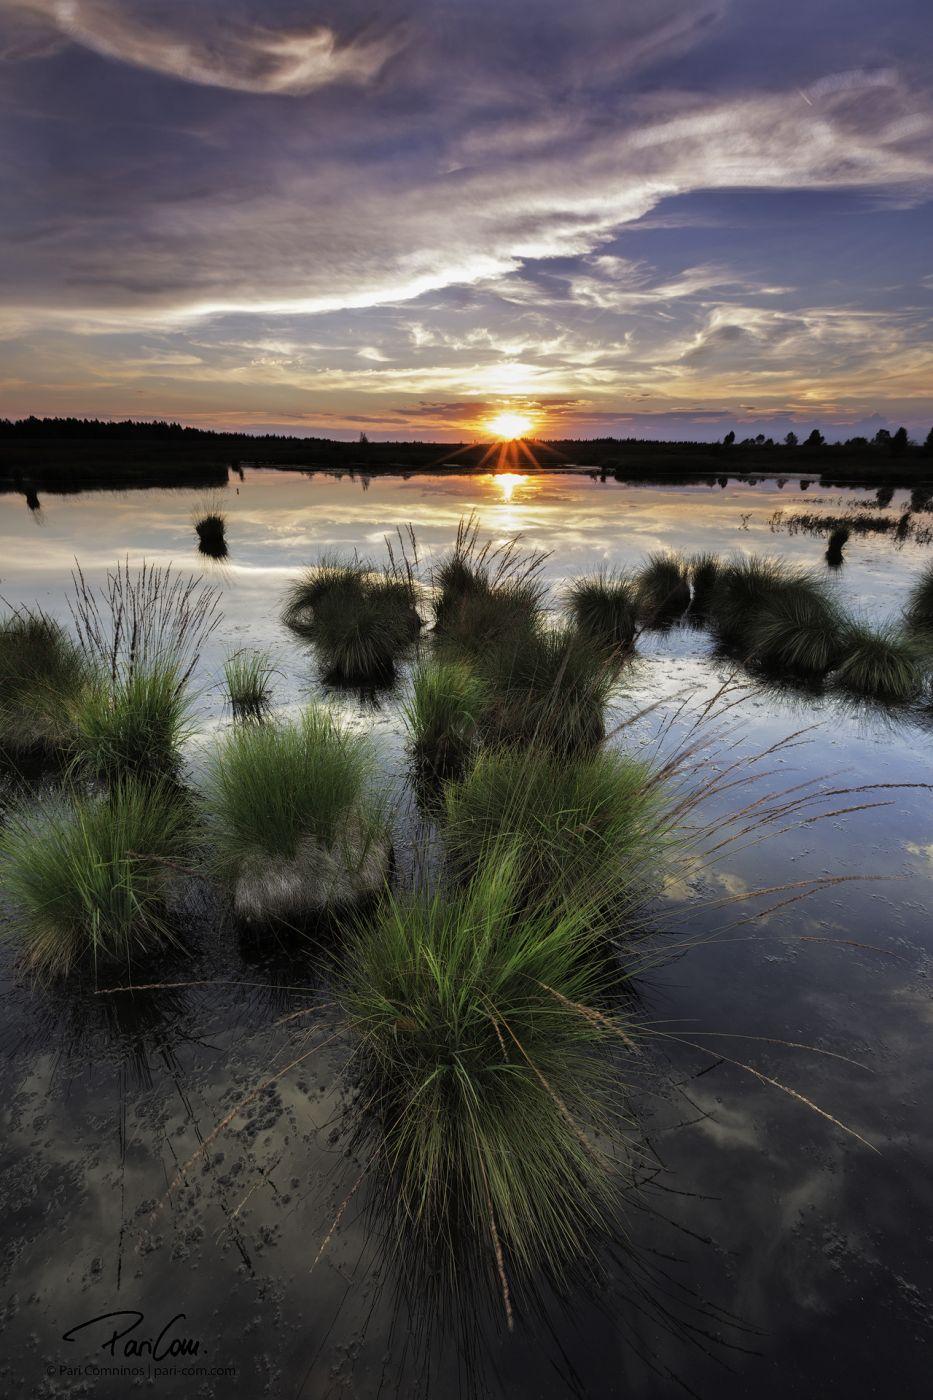 Brackvenn sunset, Belgium